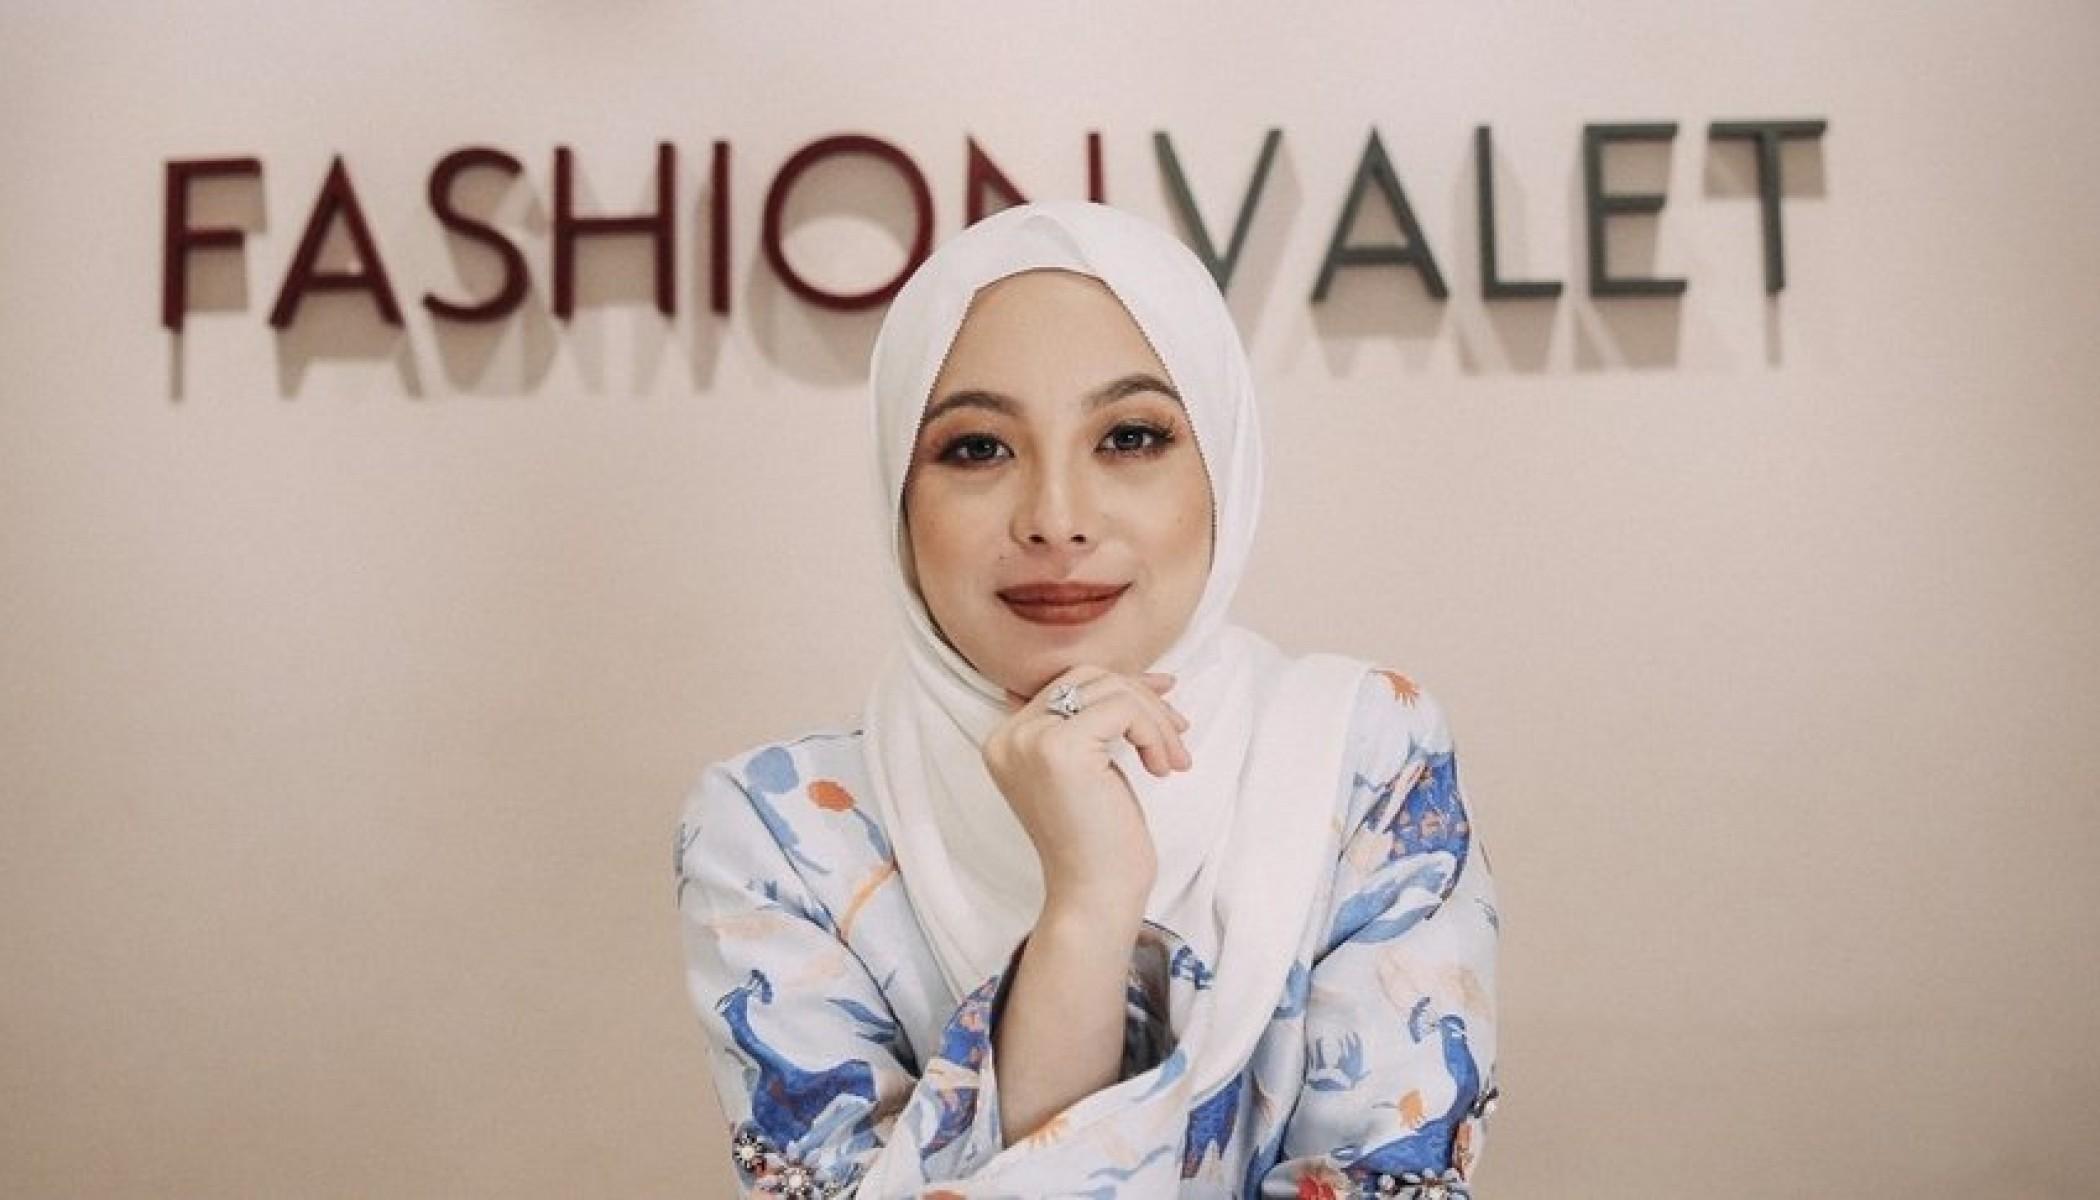 How Fashion Valet Grew Their Malaysian Empire With Digital Marketing - Skale